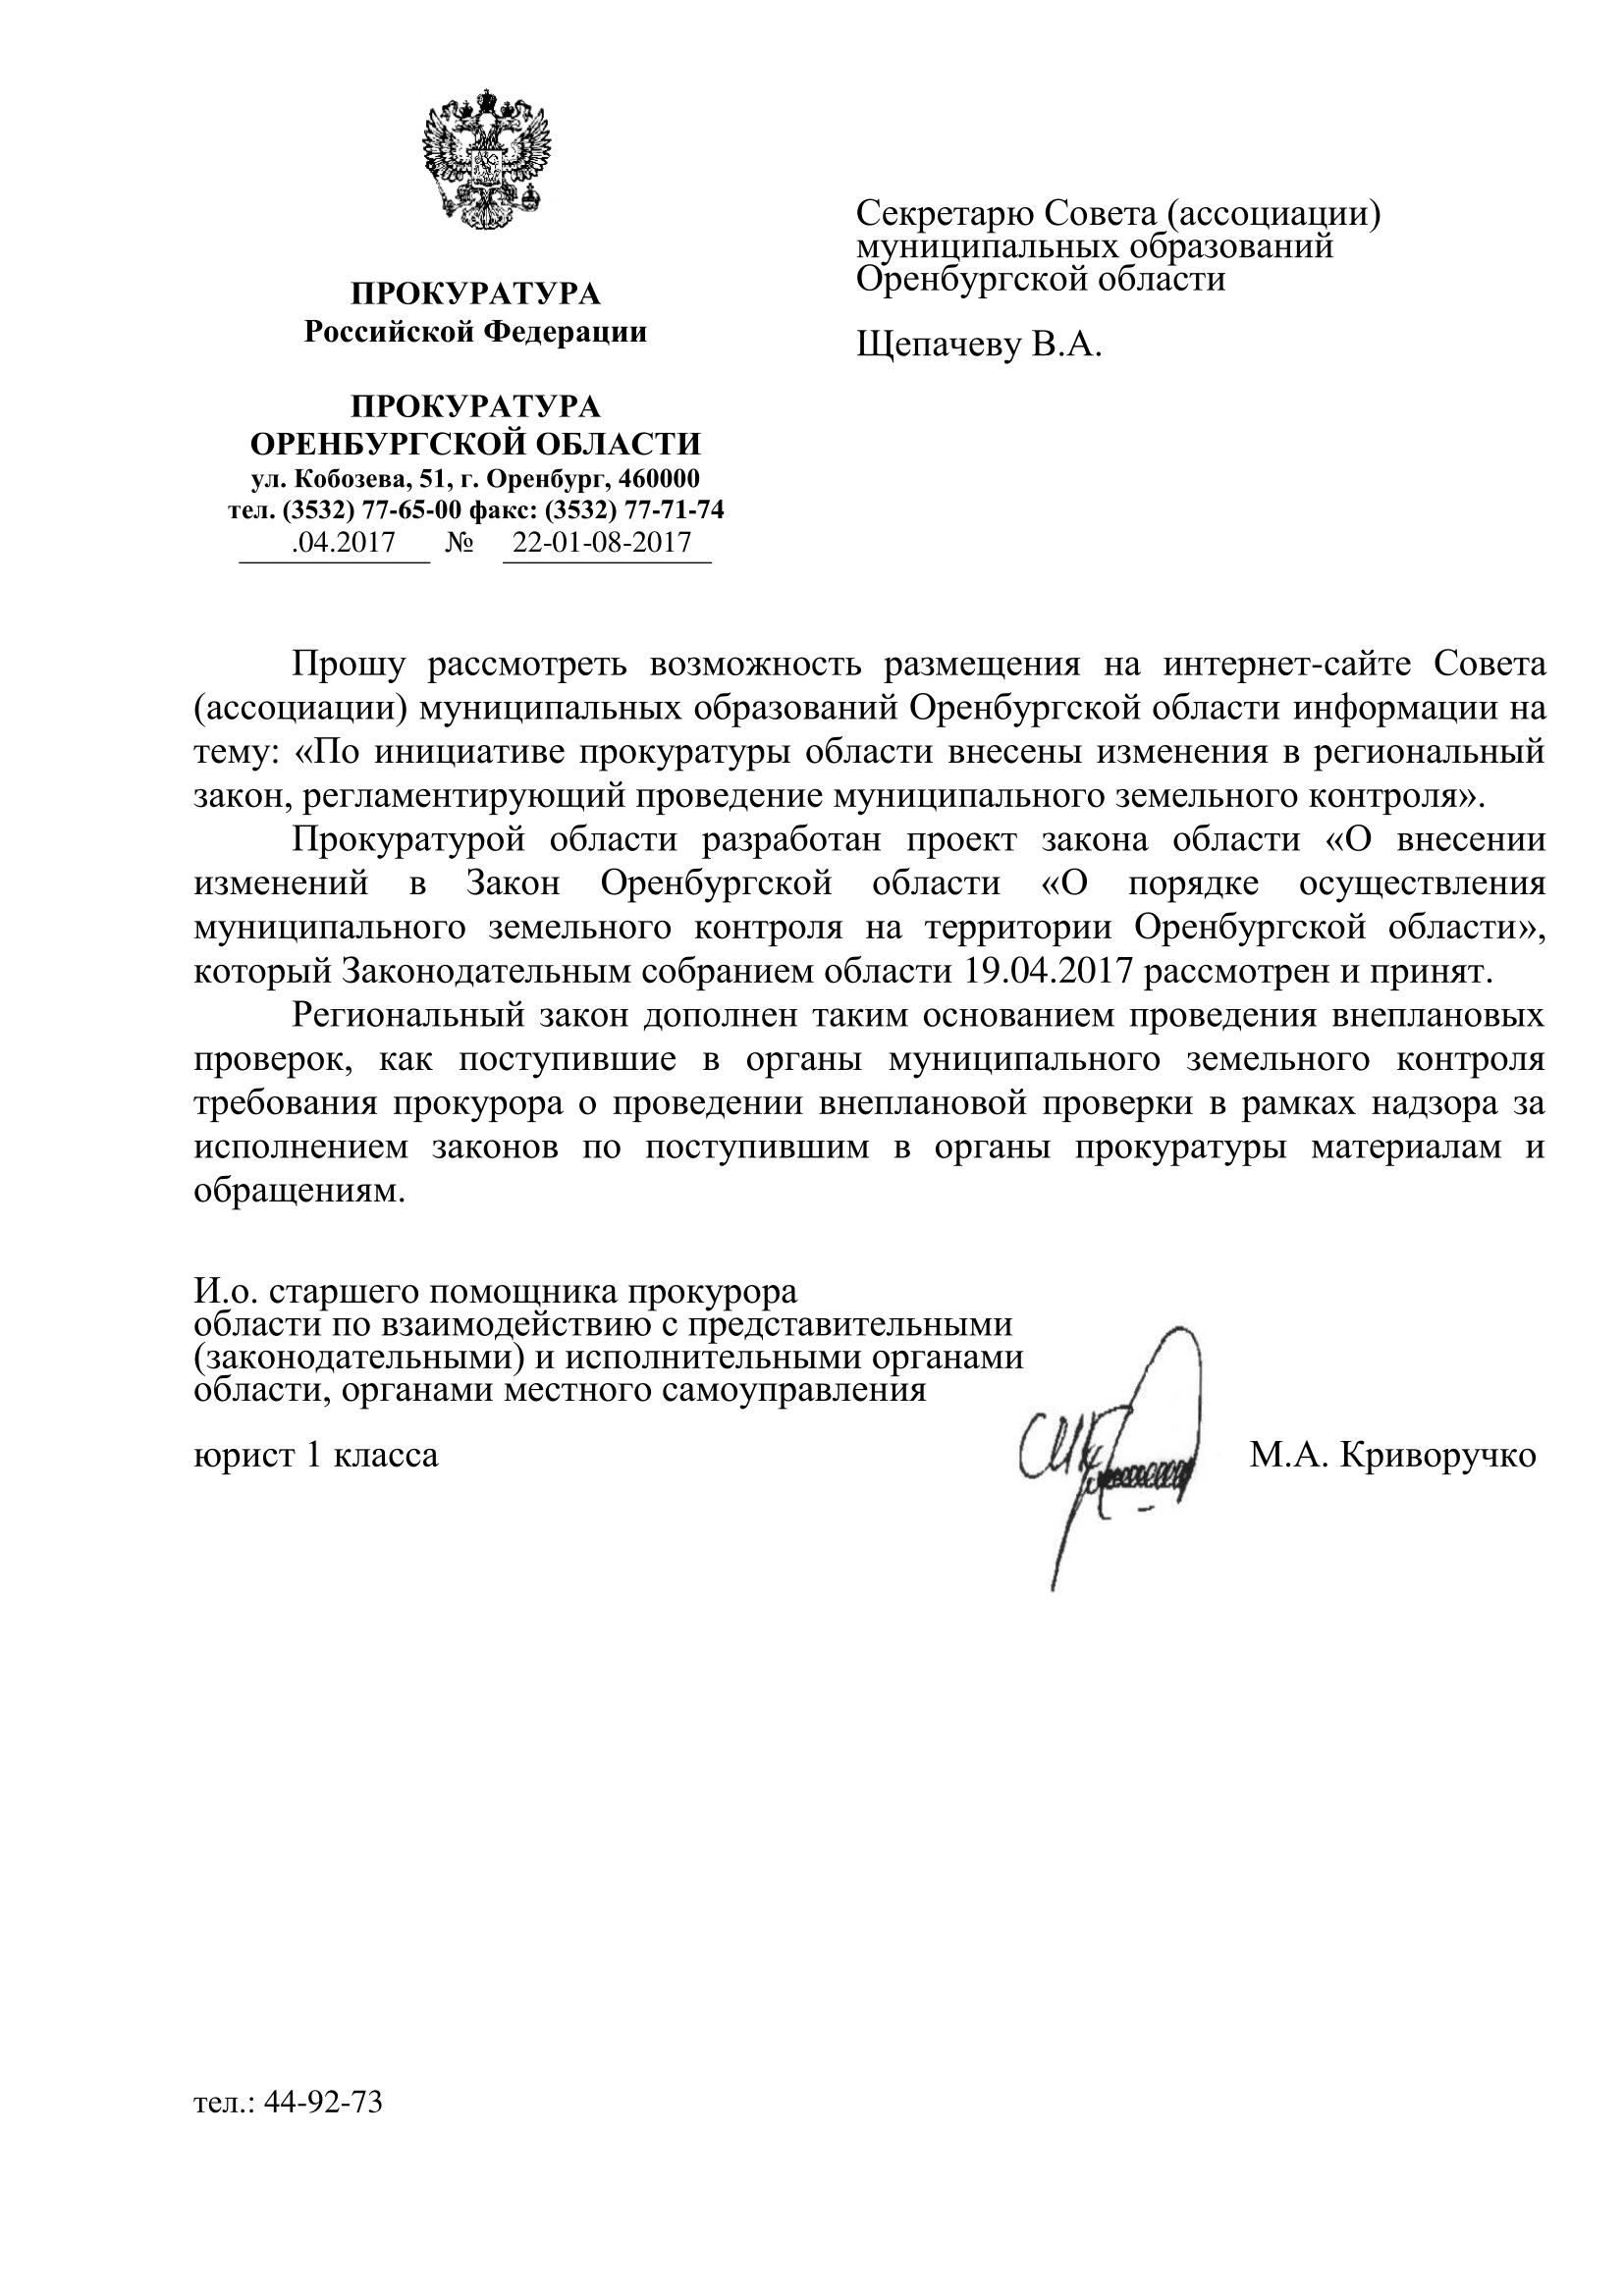 Информация Прокуратуры-1